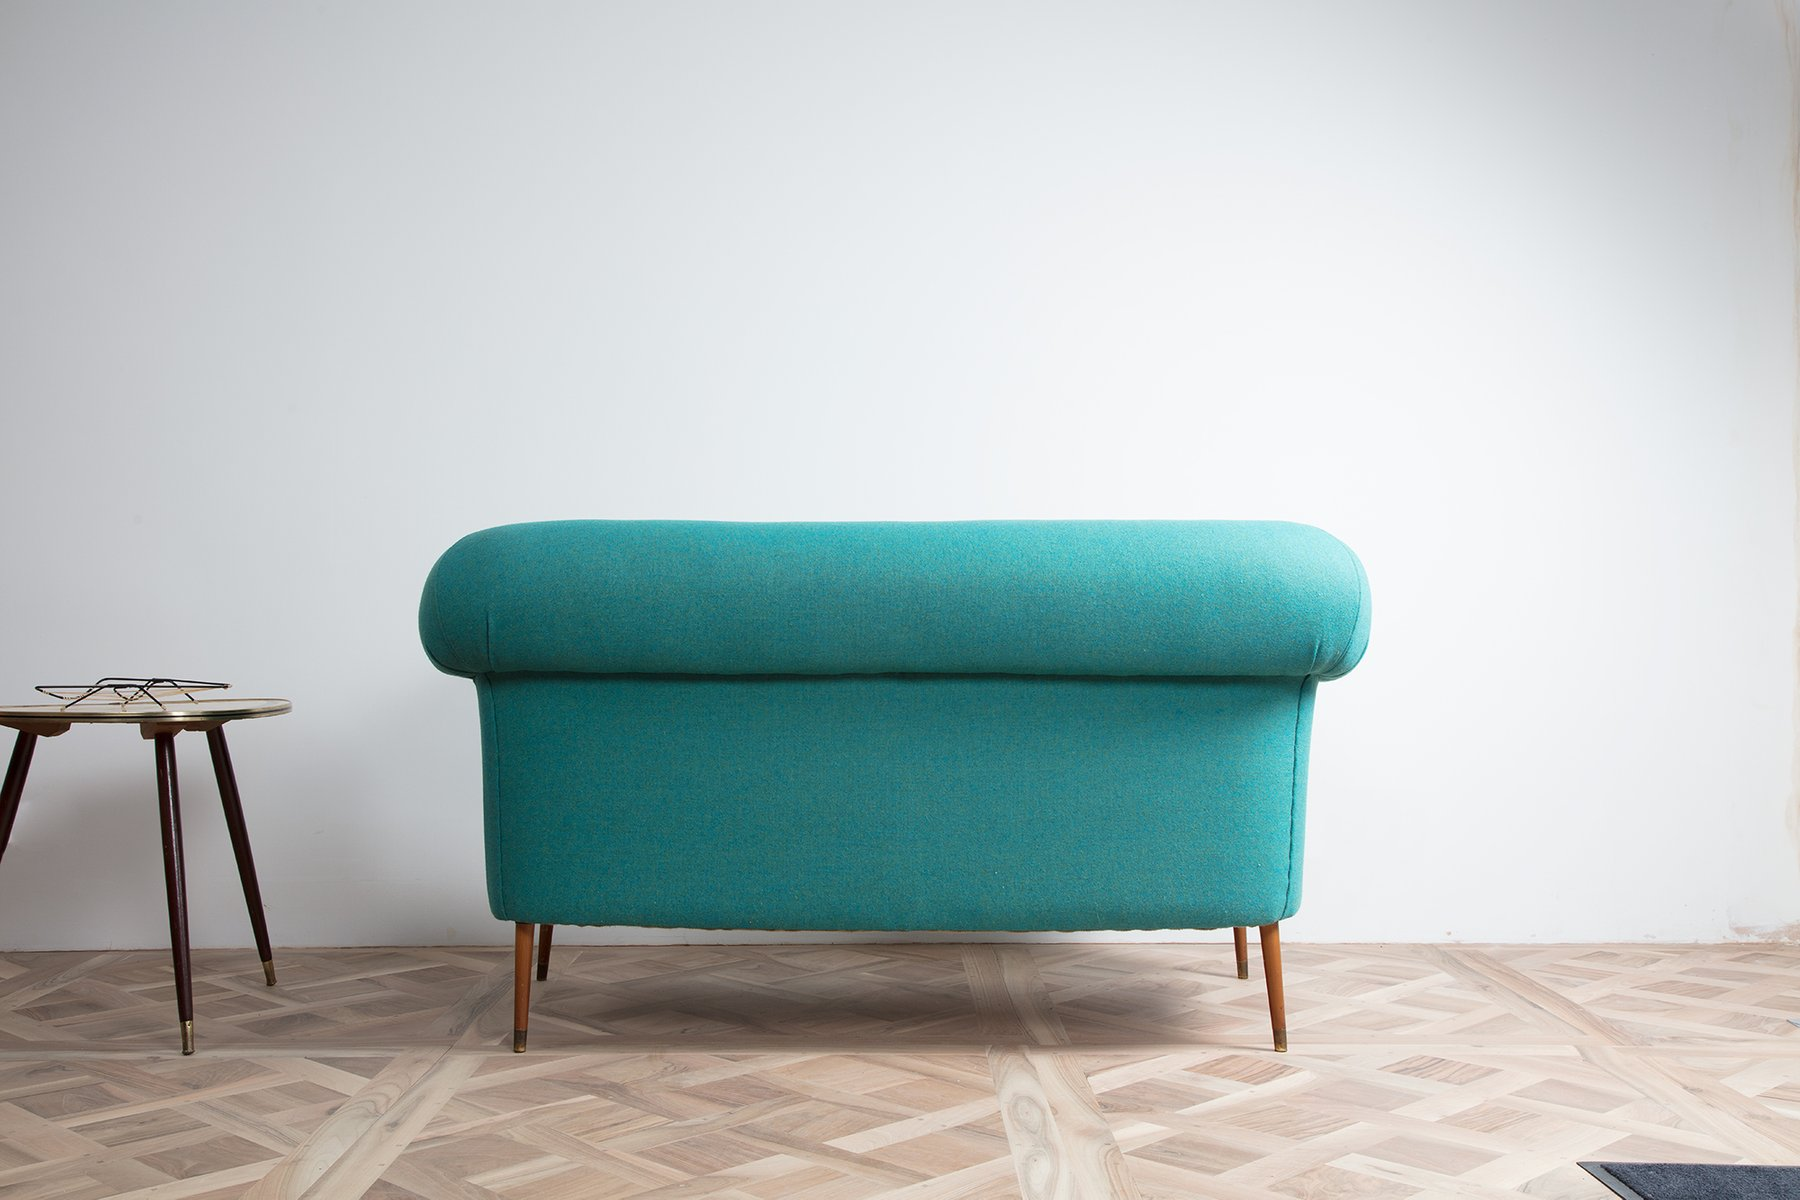 canap vintage style chesterfield en vente sur pamono. Black Bedroom Furniture Sets. Home Design Ideas